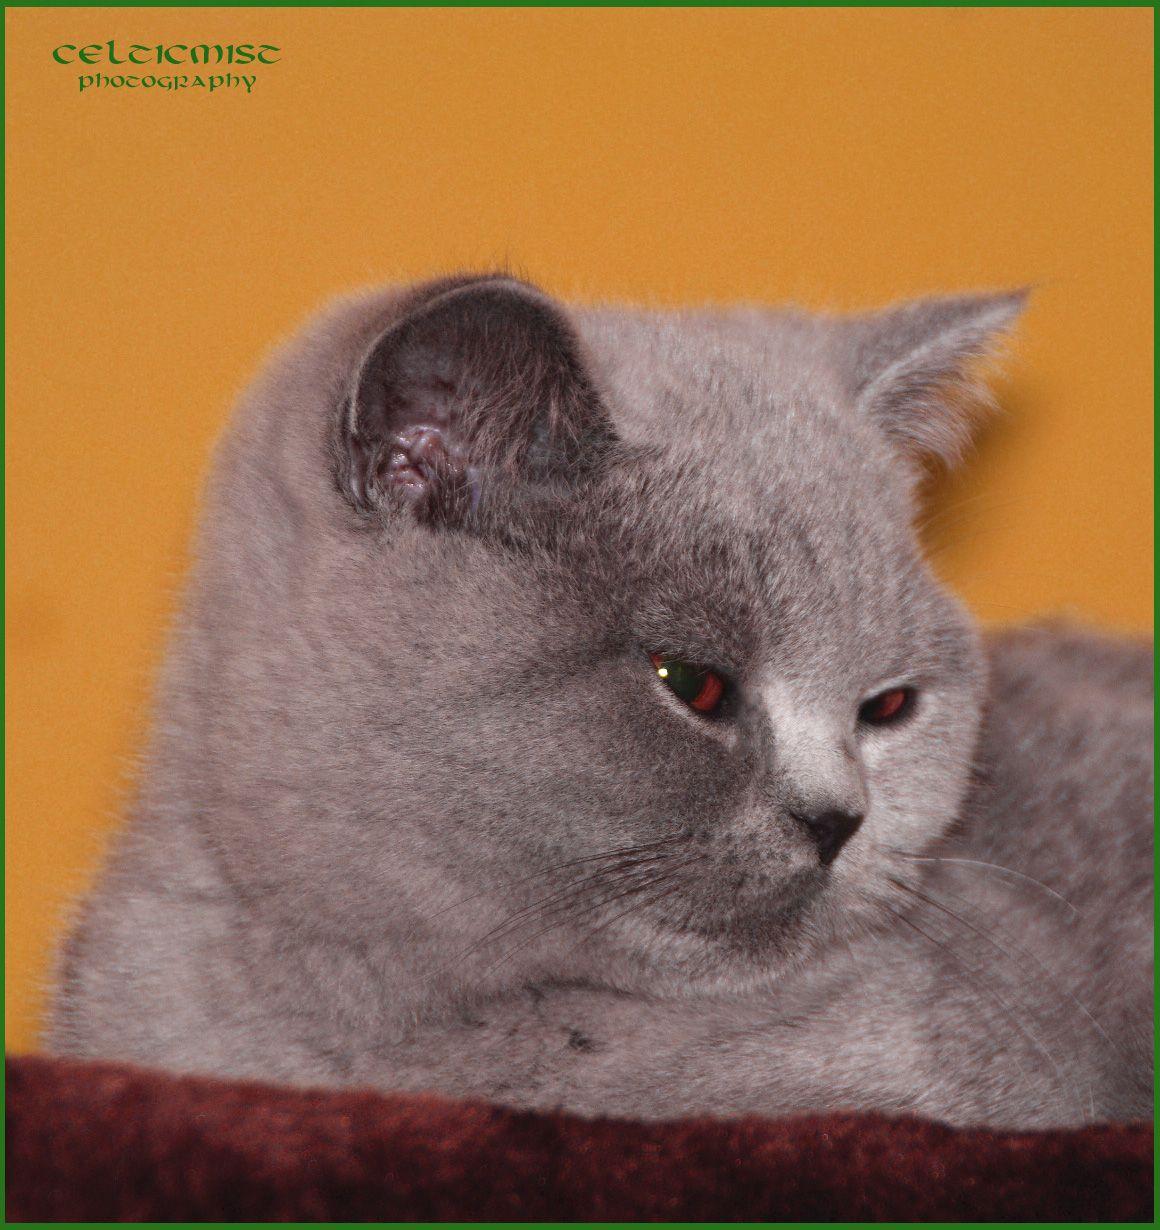 Gaya Brylantowa Elita 5 Months Old British Shorthair Gir Celticmist Cattery Cattery British Shorthair Cat Pics